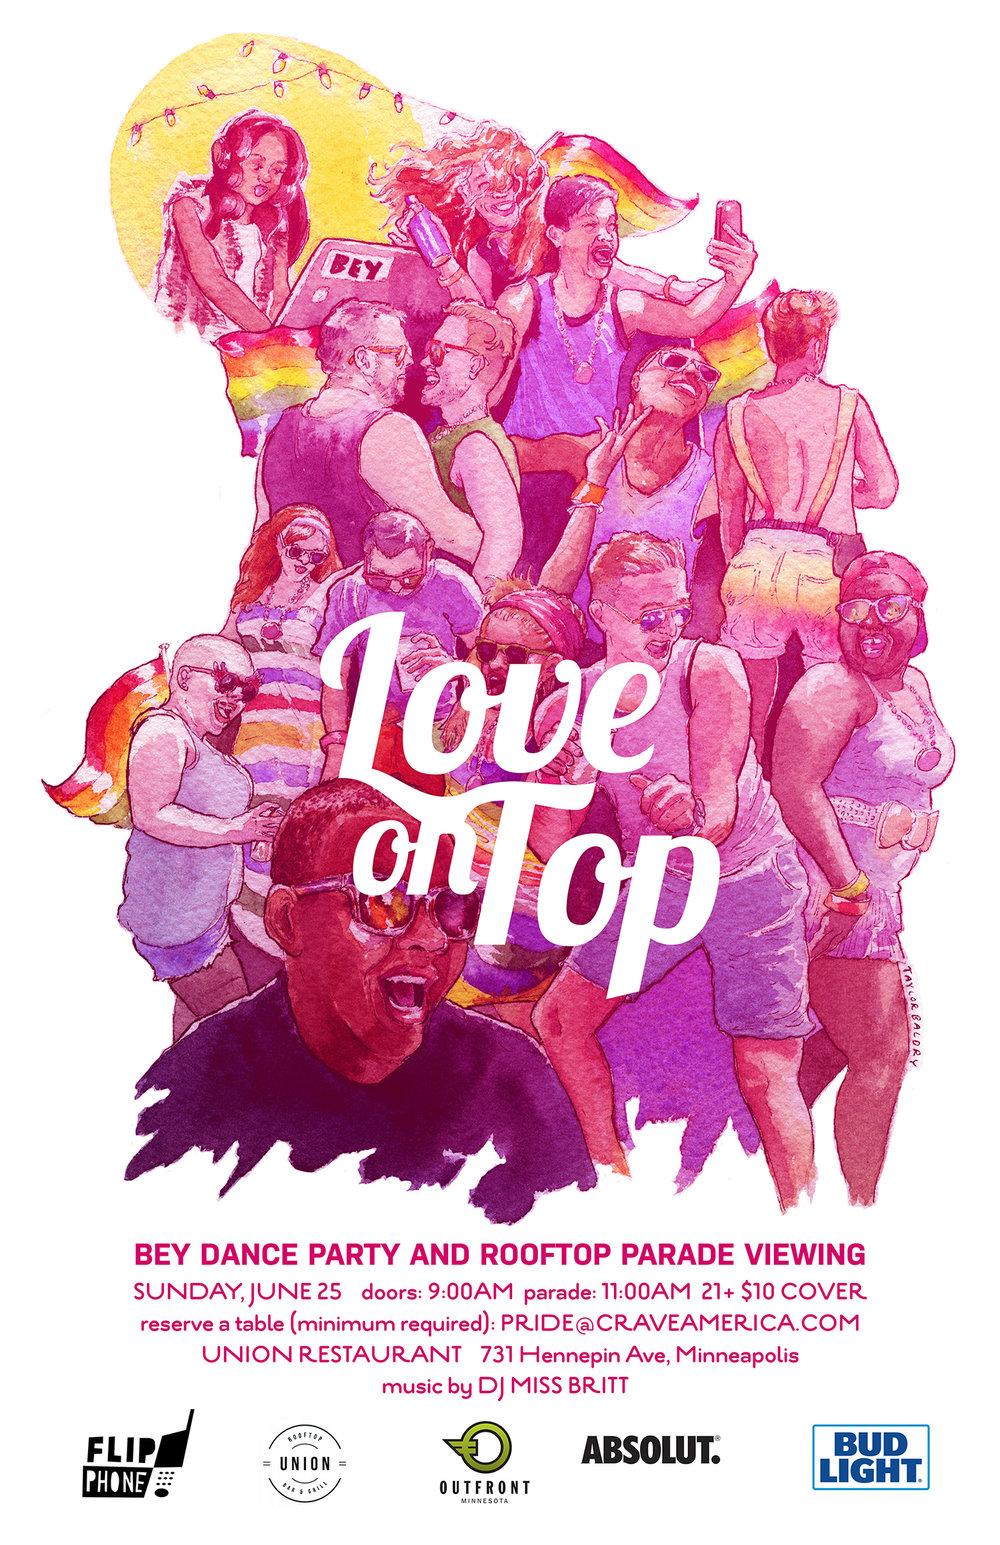 Taylor-Baldry-LoveOnTop-Poster-Flip-Phone.jpg